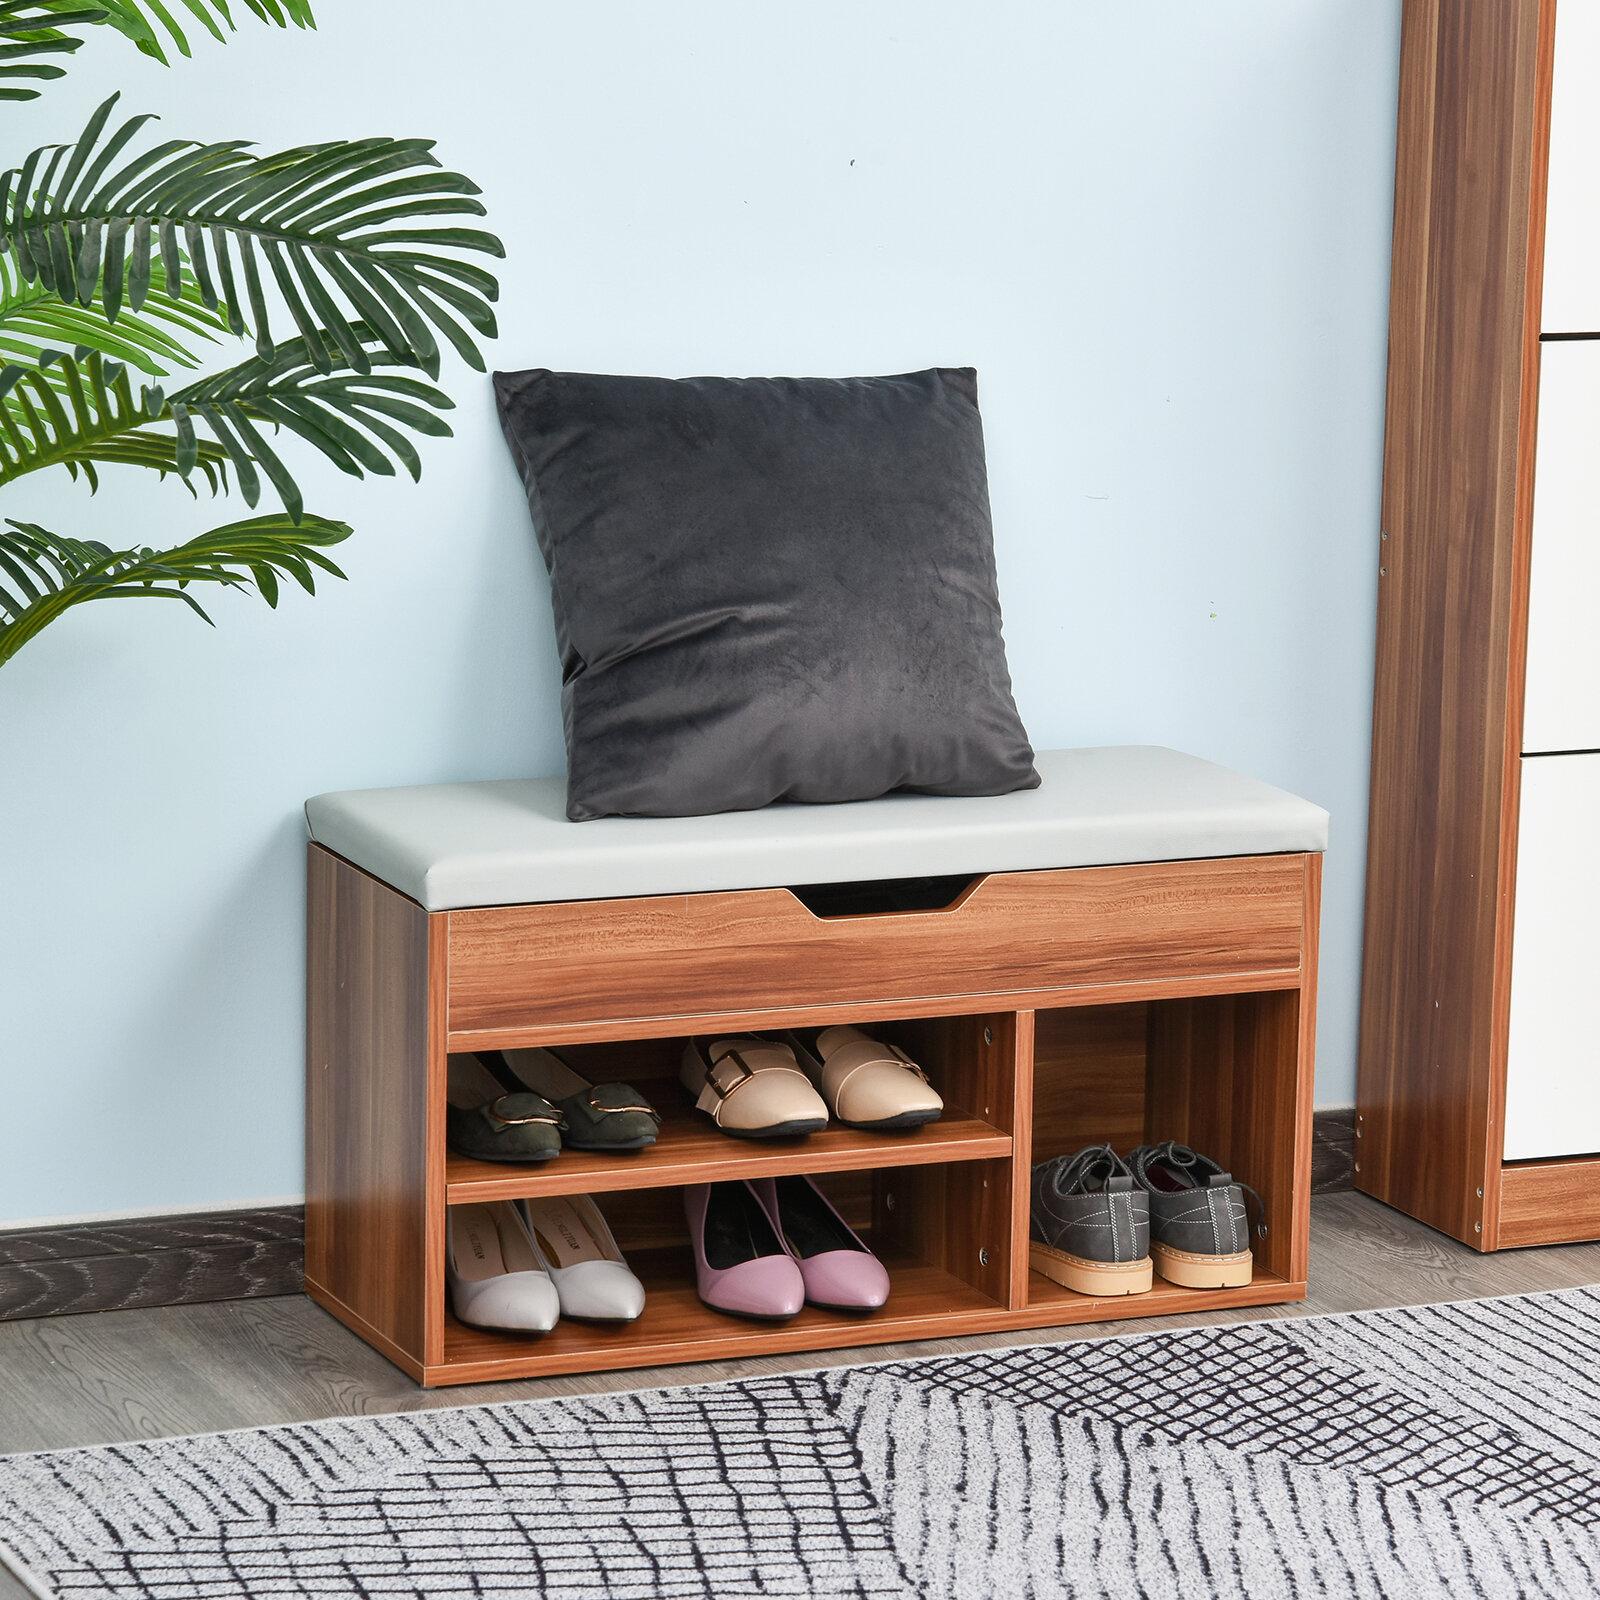 Latitude Run 6 Pair Shoe Storage Bench Reviews Wayfair